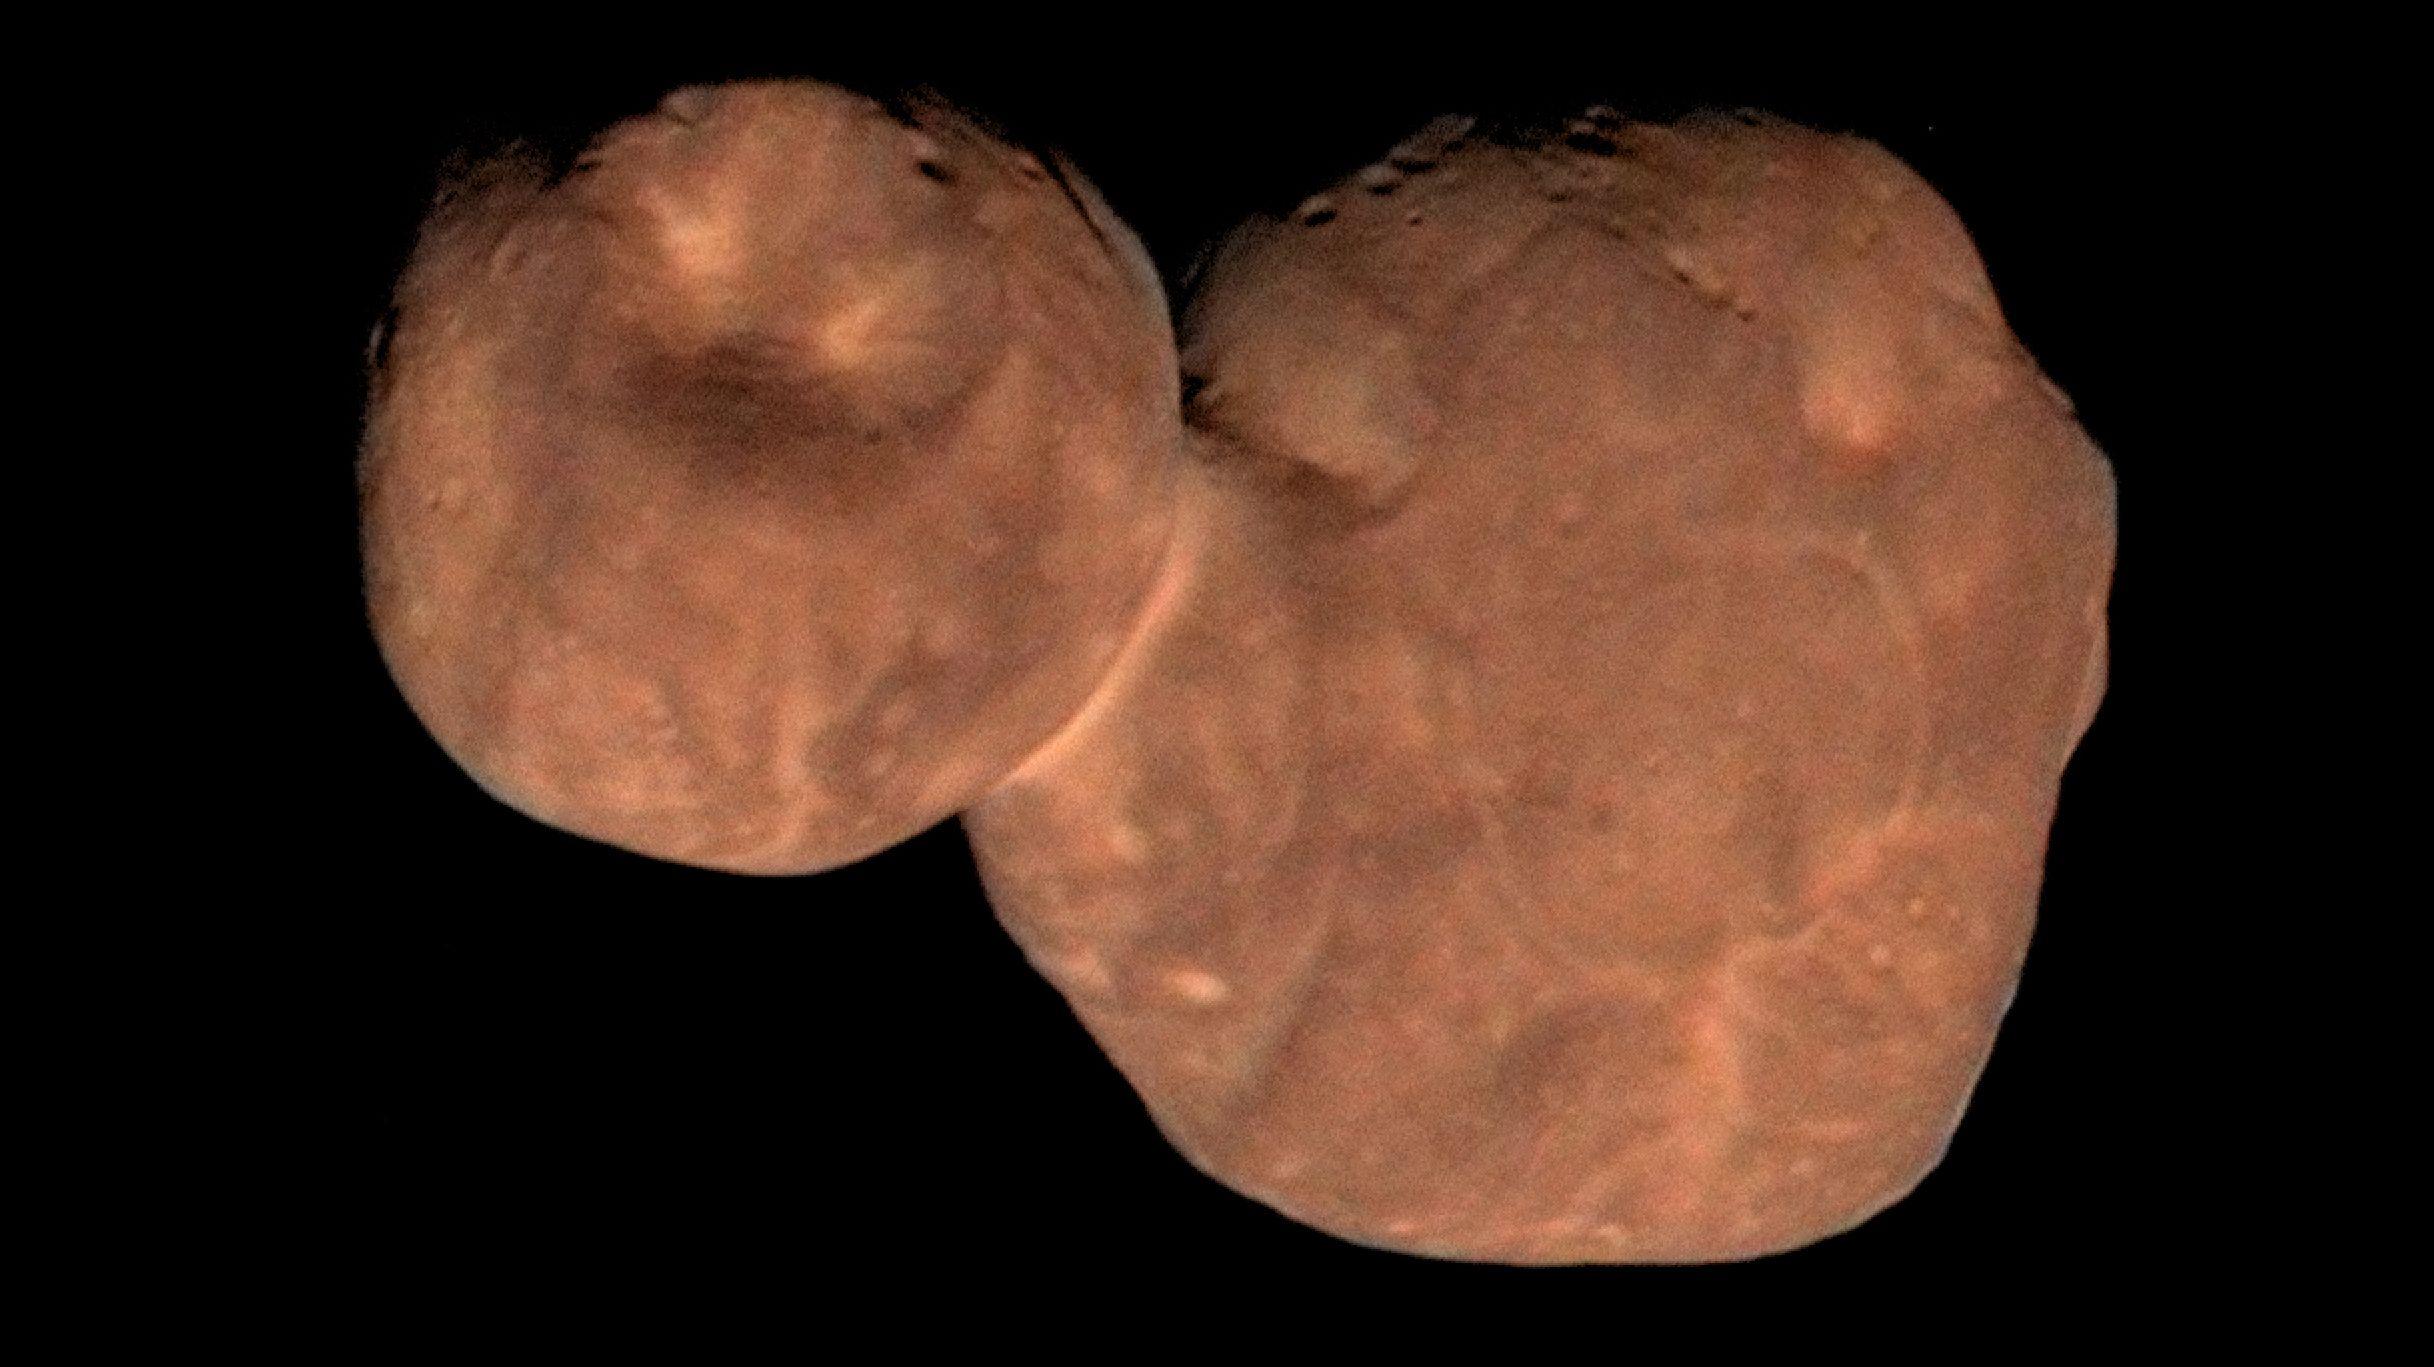 Kuipergürtel-Objekt 2014 MU69, genannt Ultima Thule